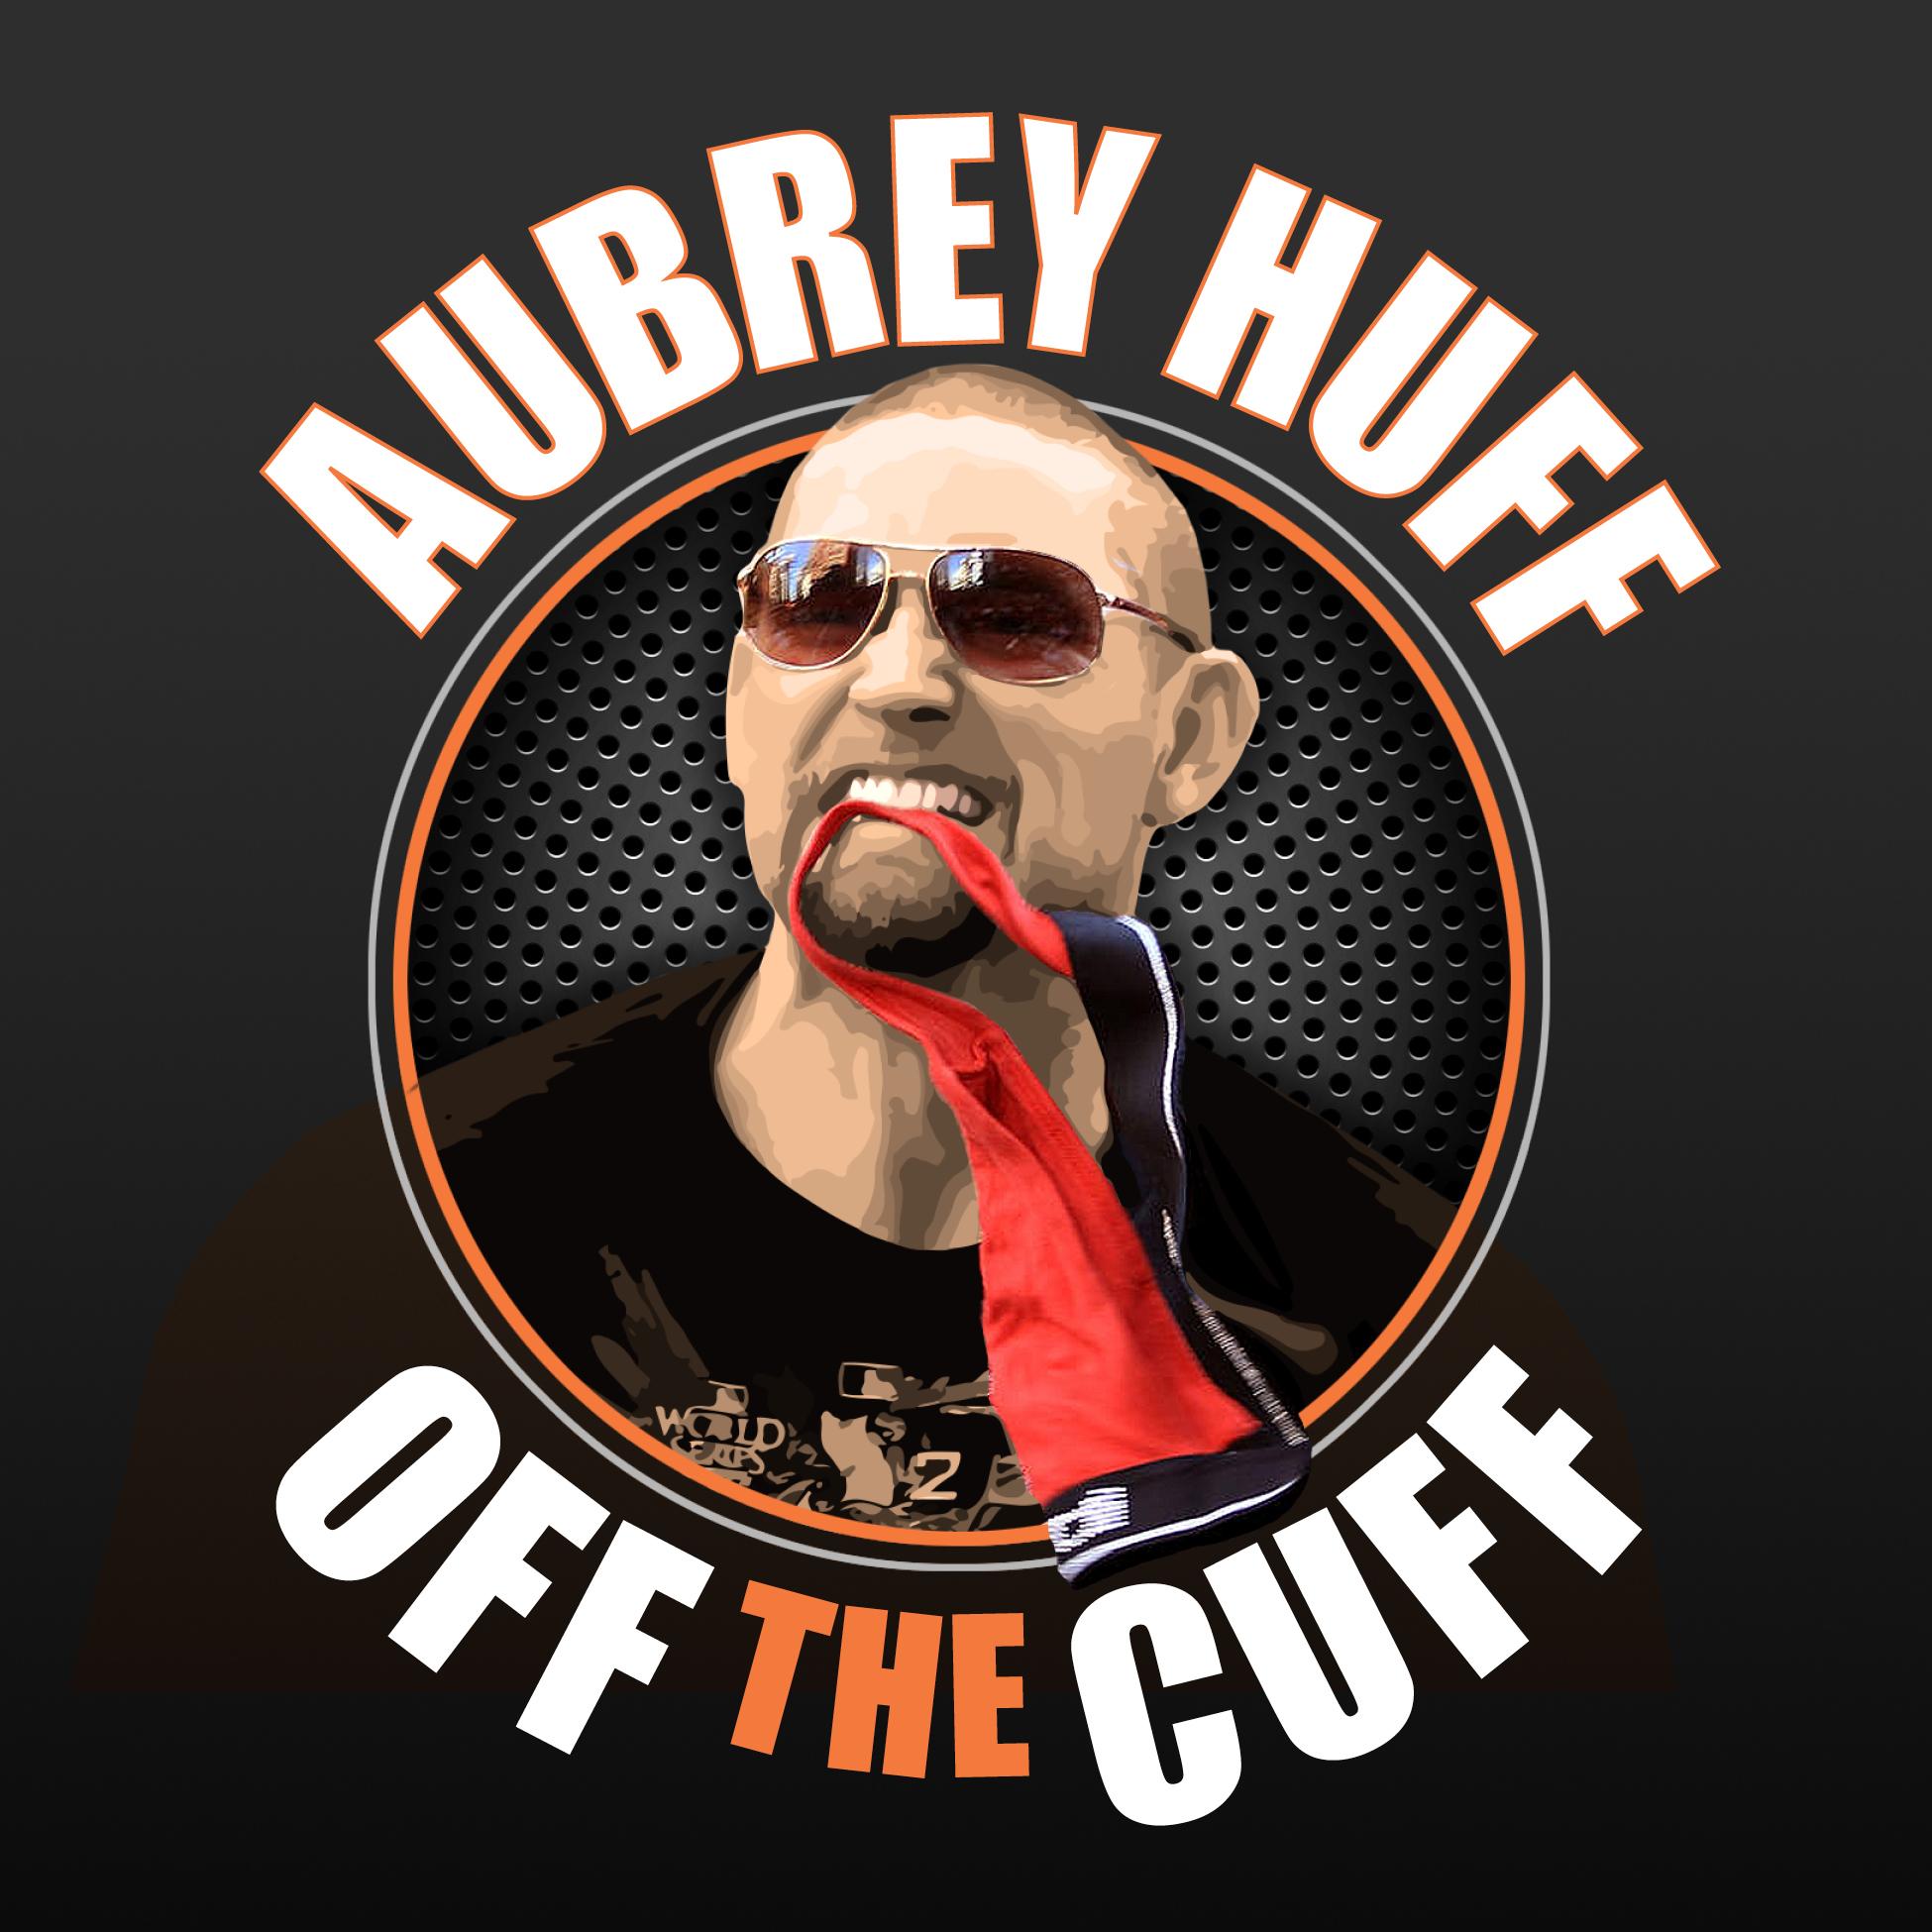 Off the Cuff with Aubrey Huff